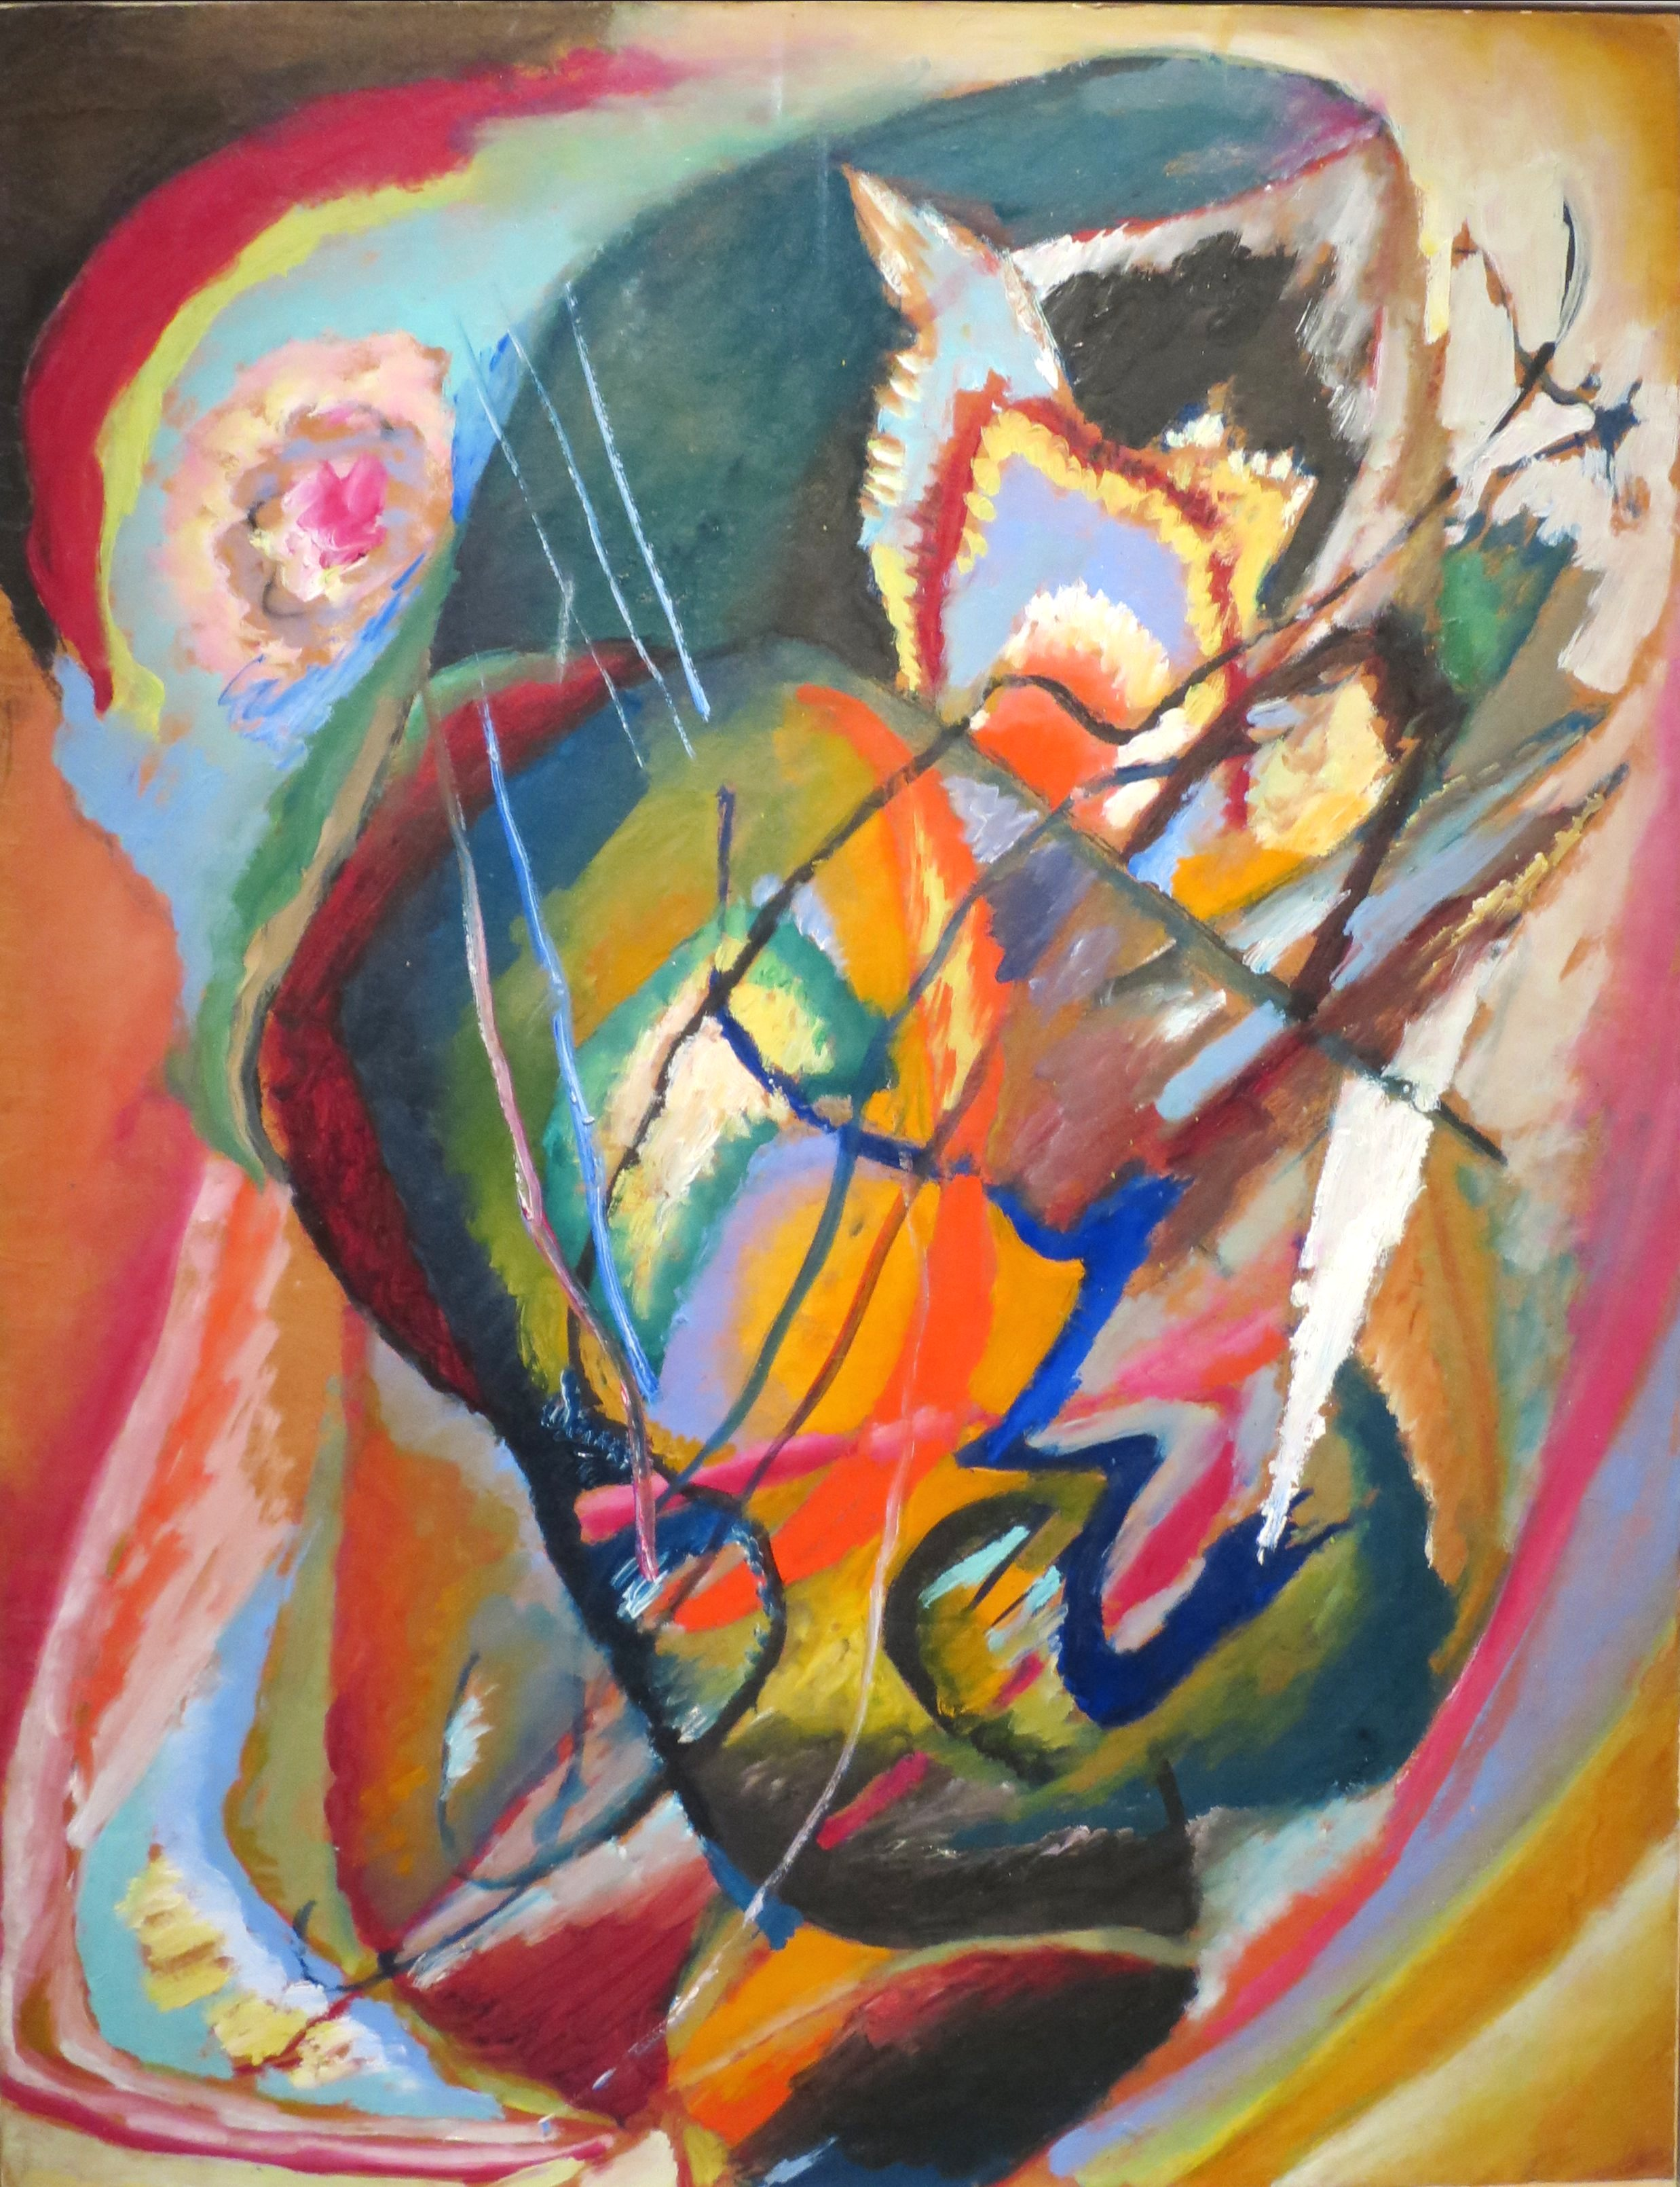 Untitled Improvisation III , 1914, by Wassily Kandinsky (1866-1944)